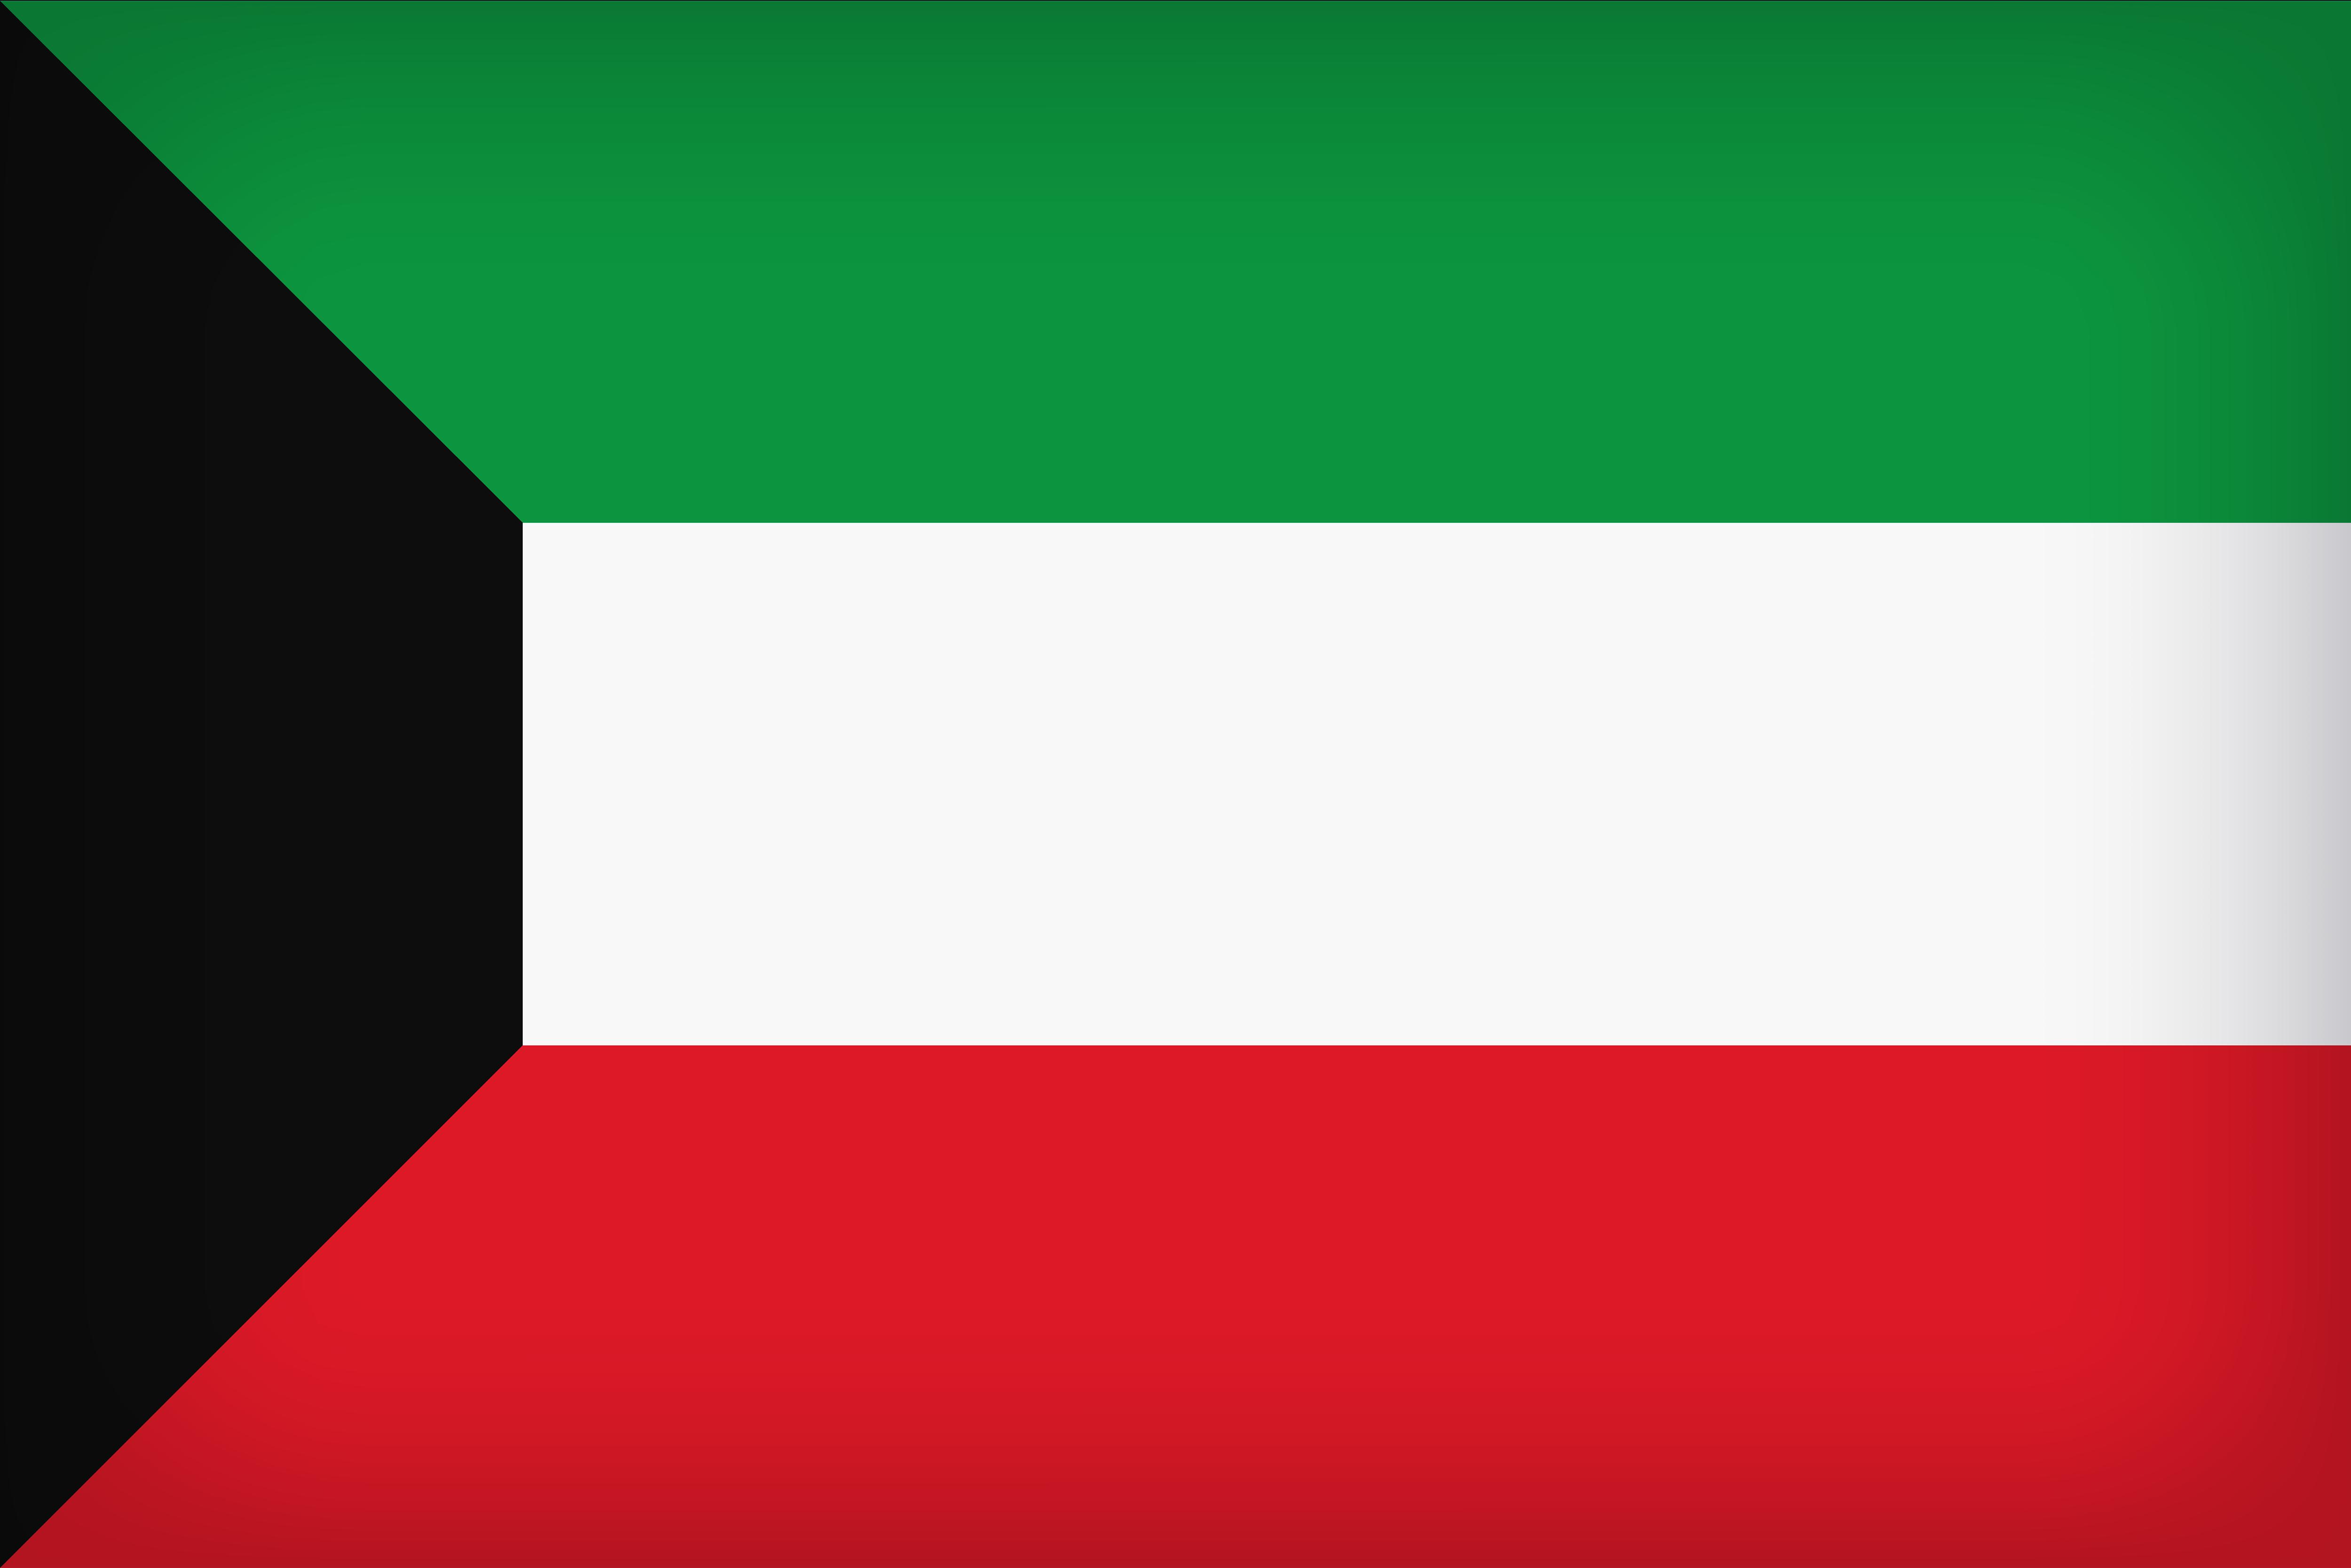 Kuwait_Large_Flag.png?m=1441179092.